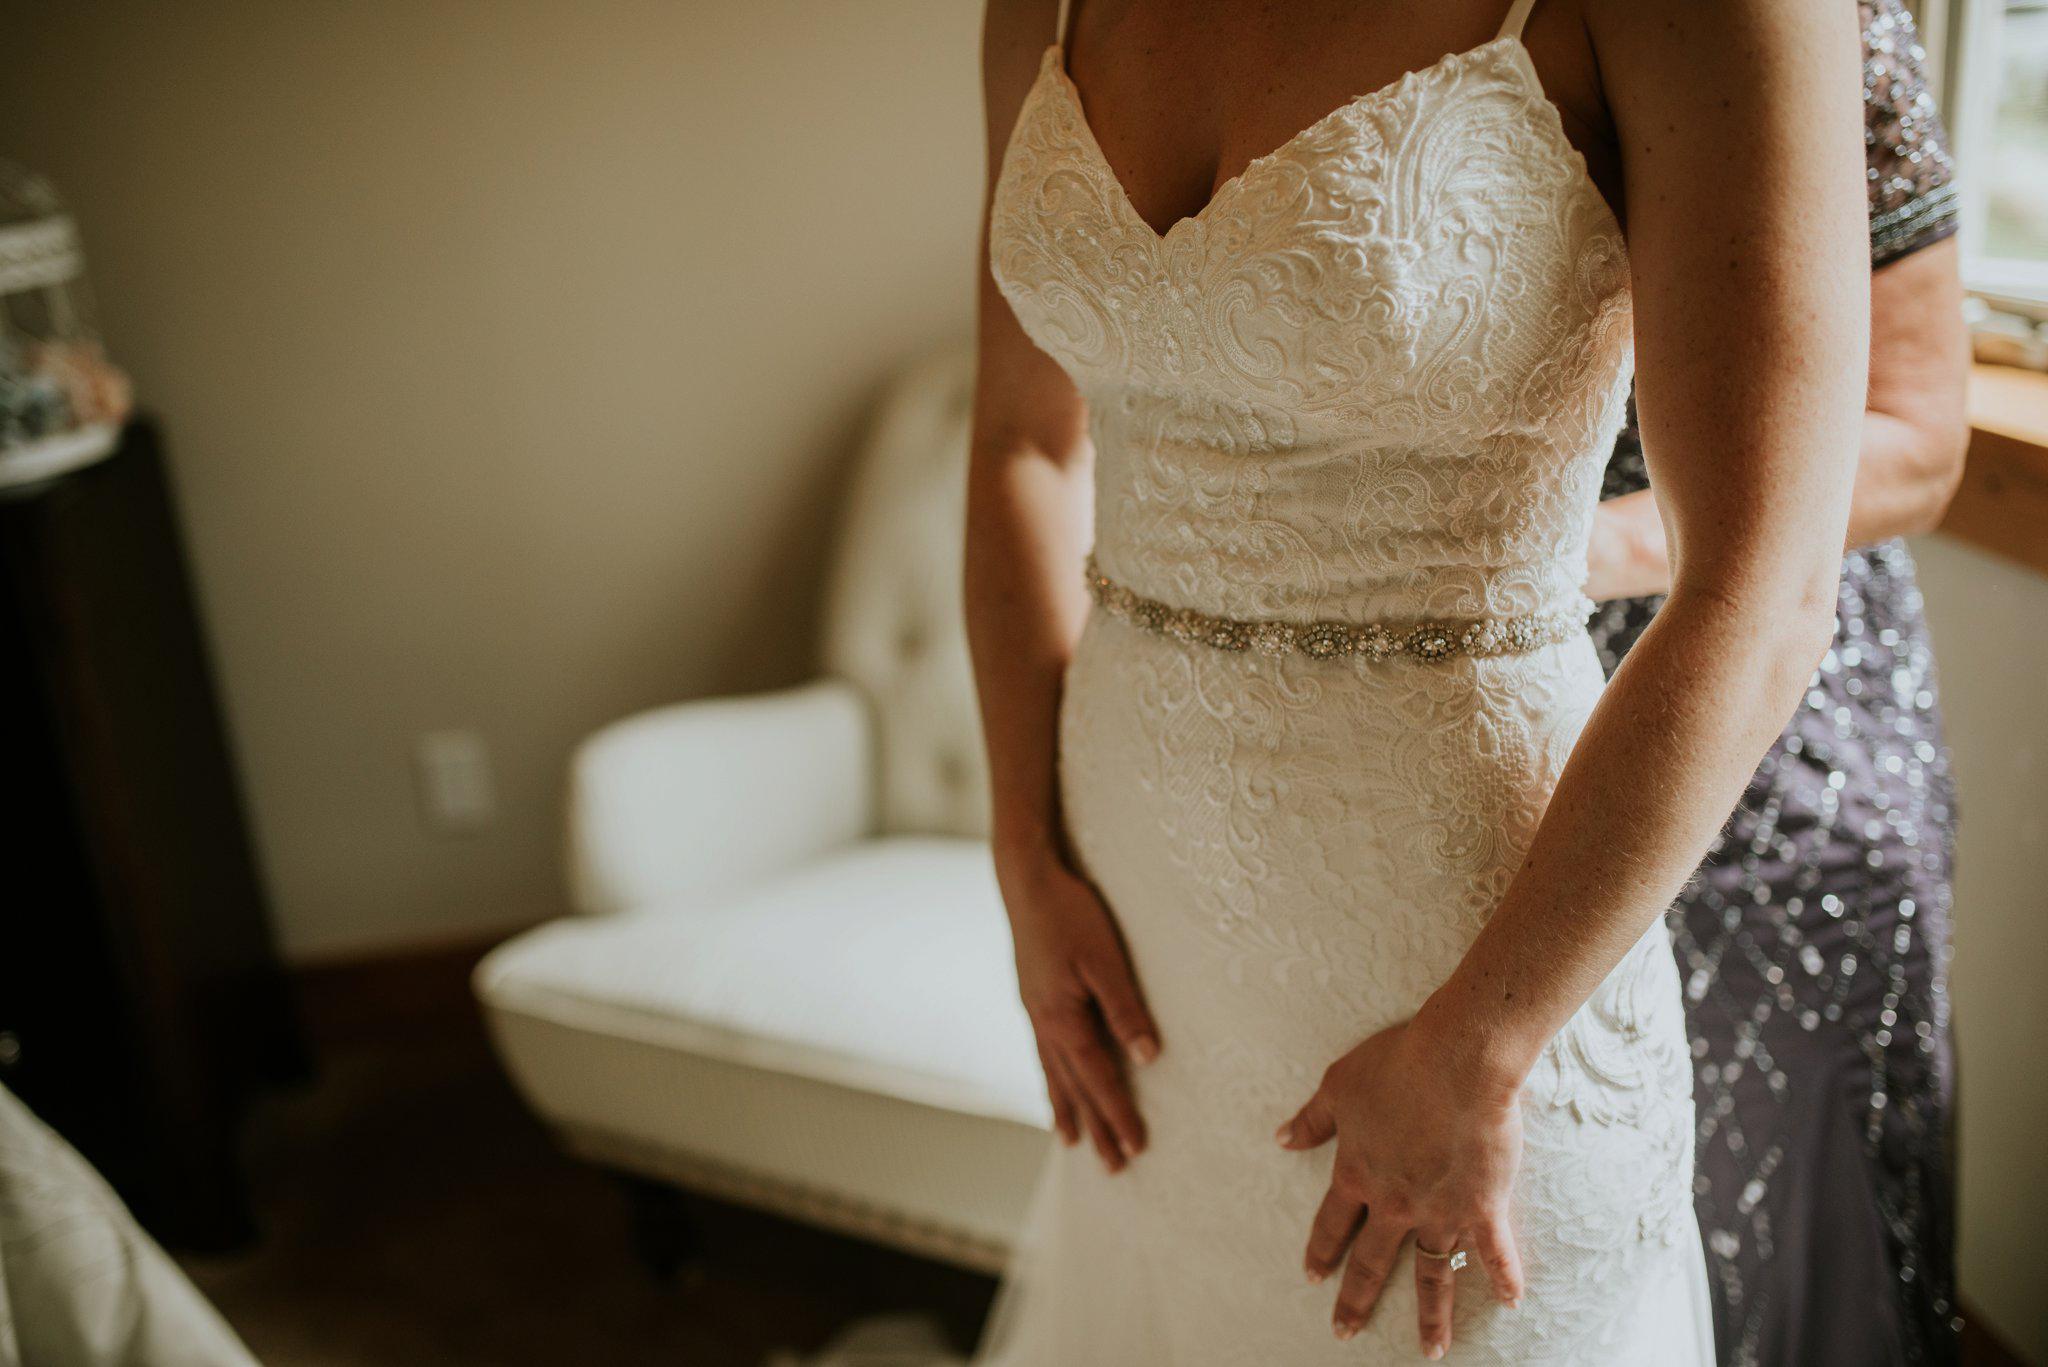 hollywood-school-house-wedding-seattle-photographer-caitlyn-nikula-19.jpg